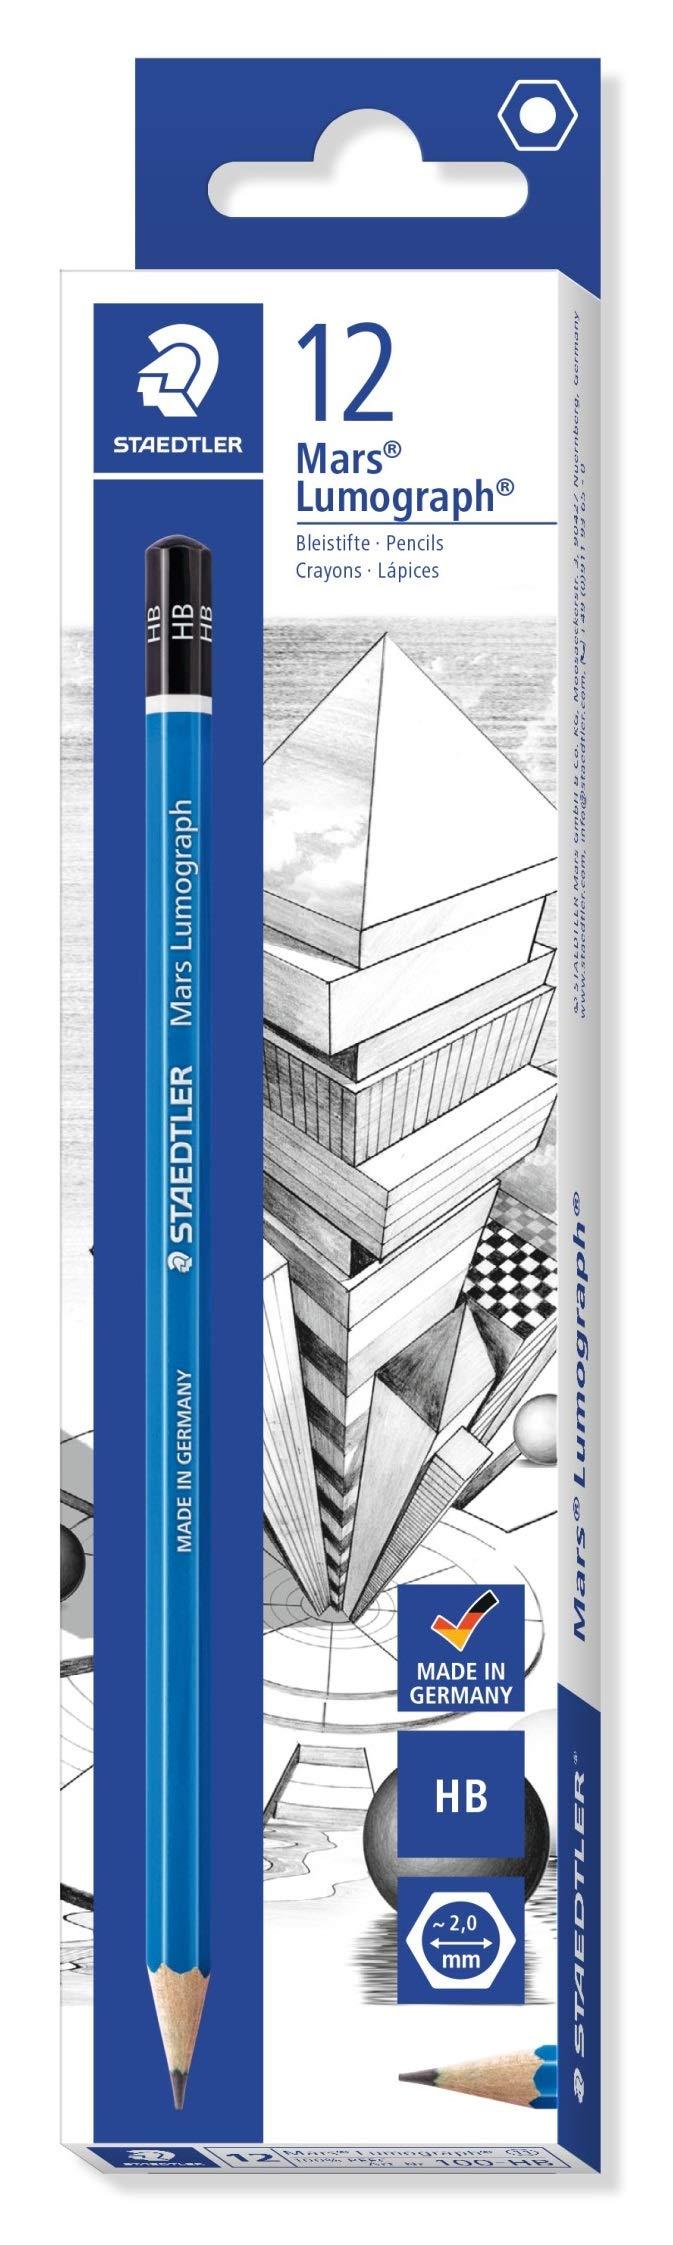 STAEDTLER Mars 100-HB LUMOGRAPH Pencil HB - Box of 12 by STAEDTLER